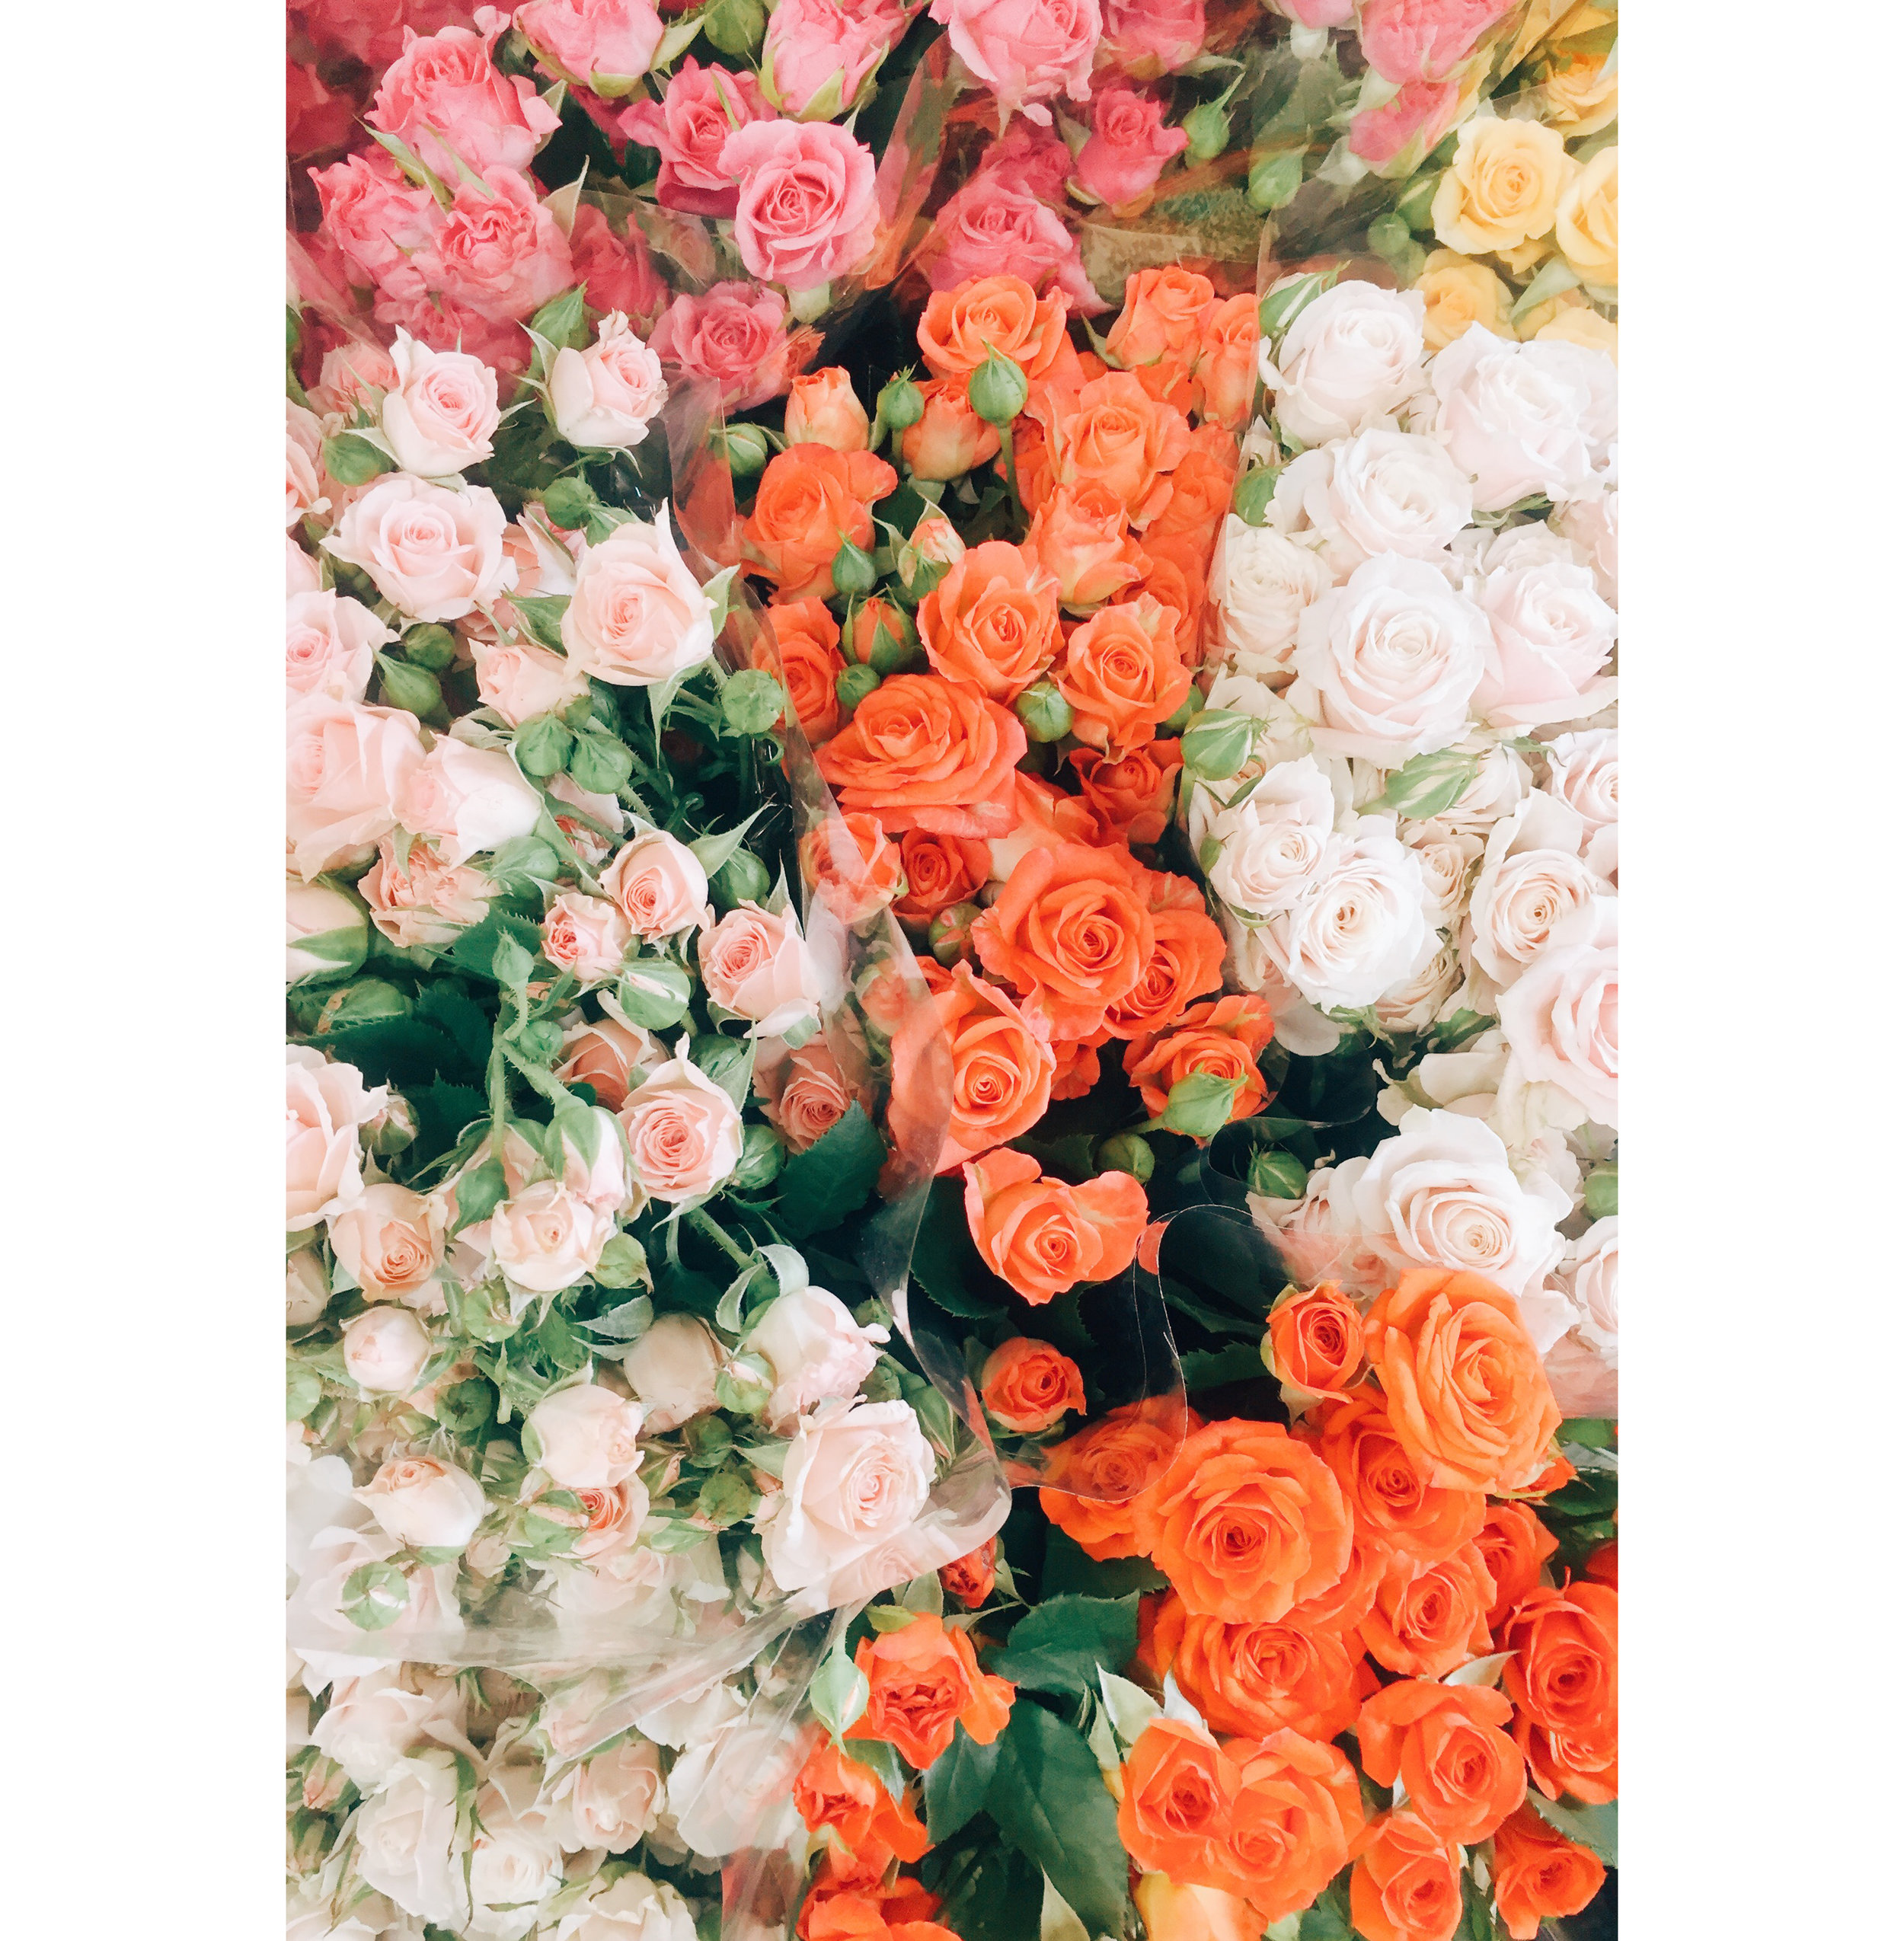 Citrus Colored Roses.jpg